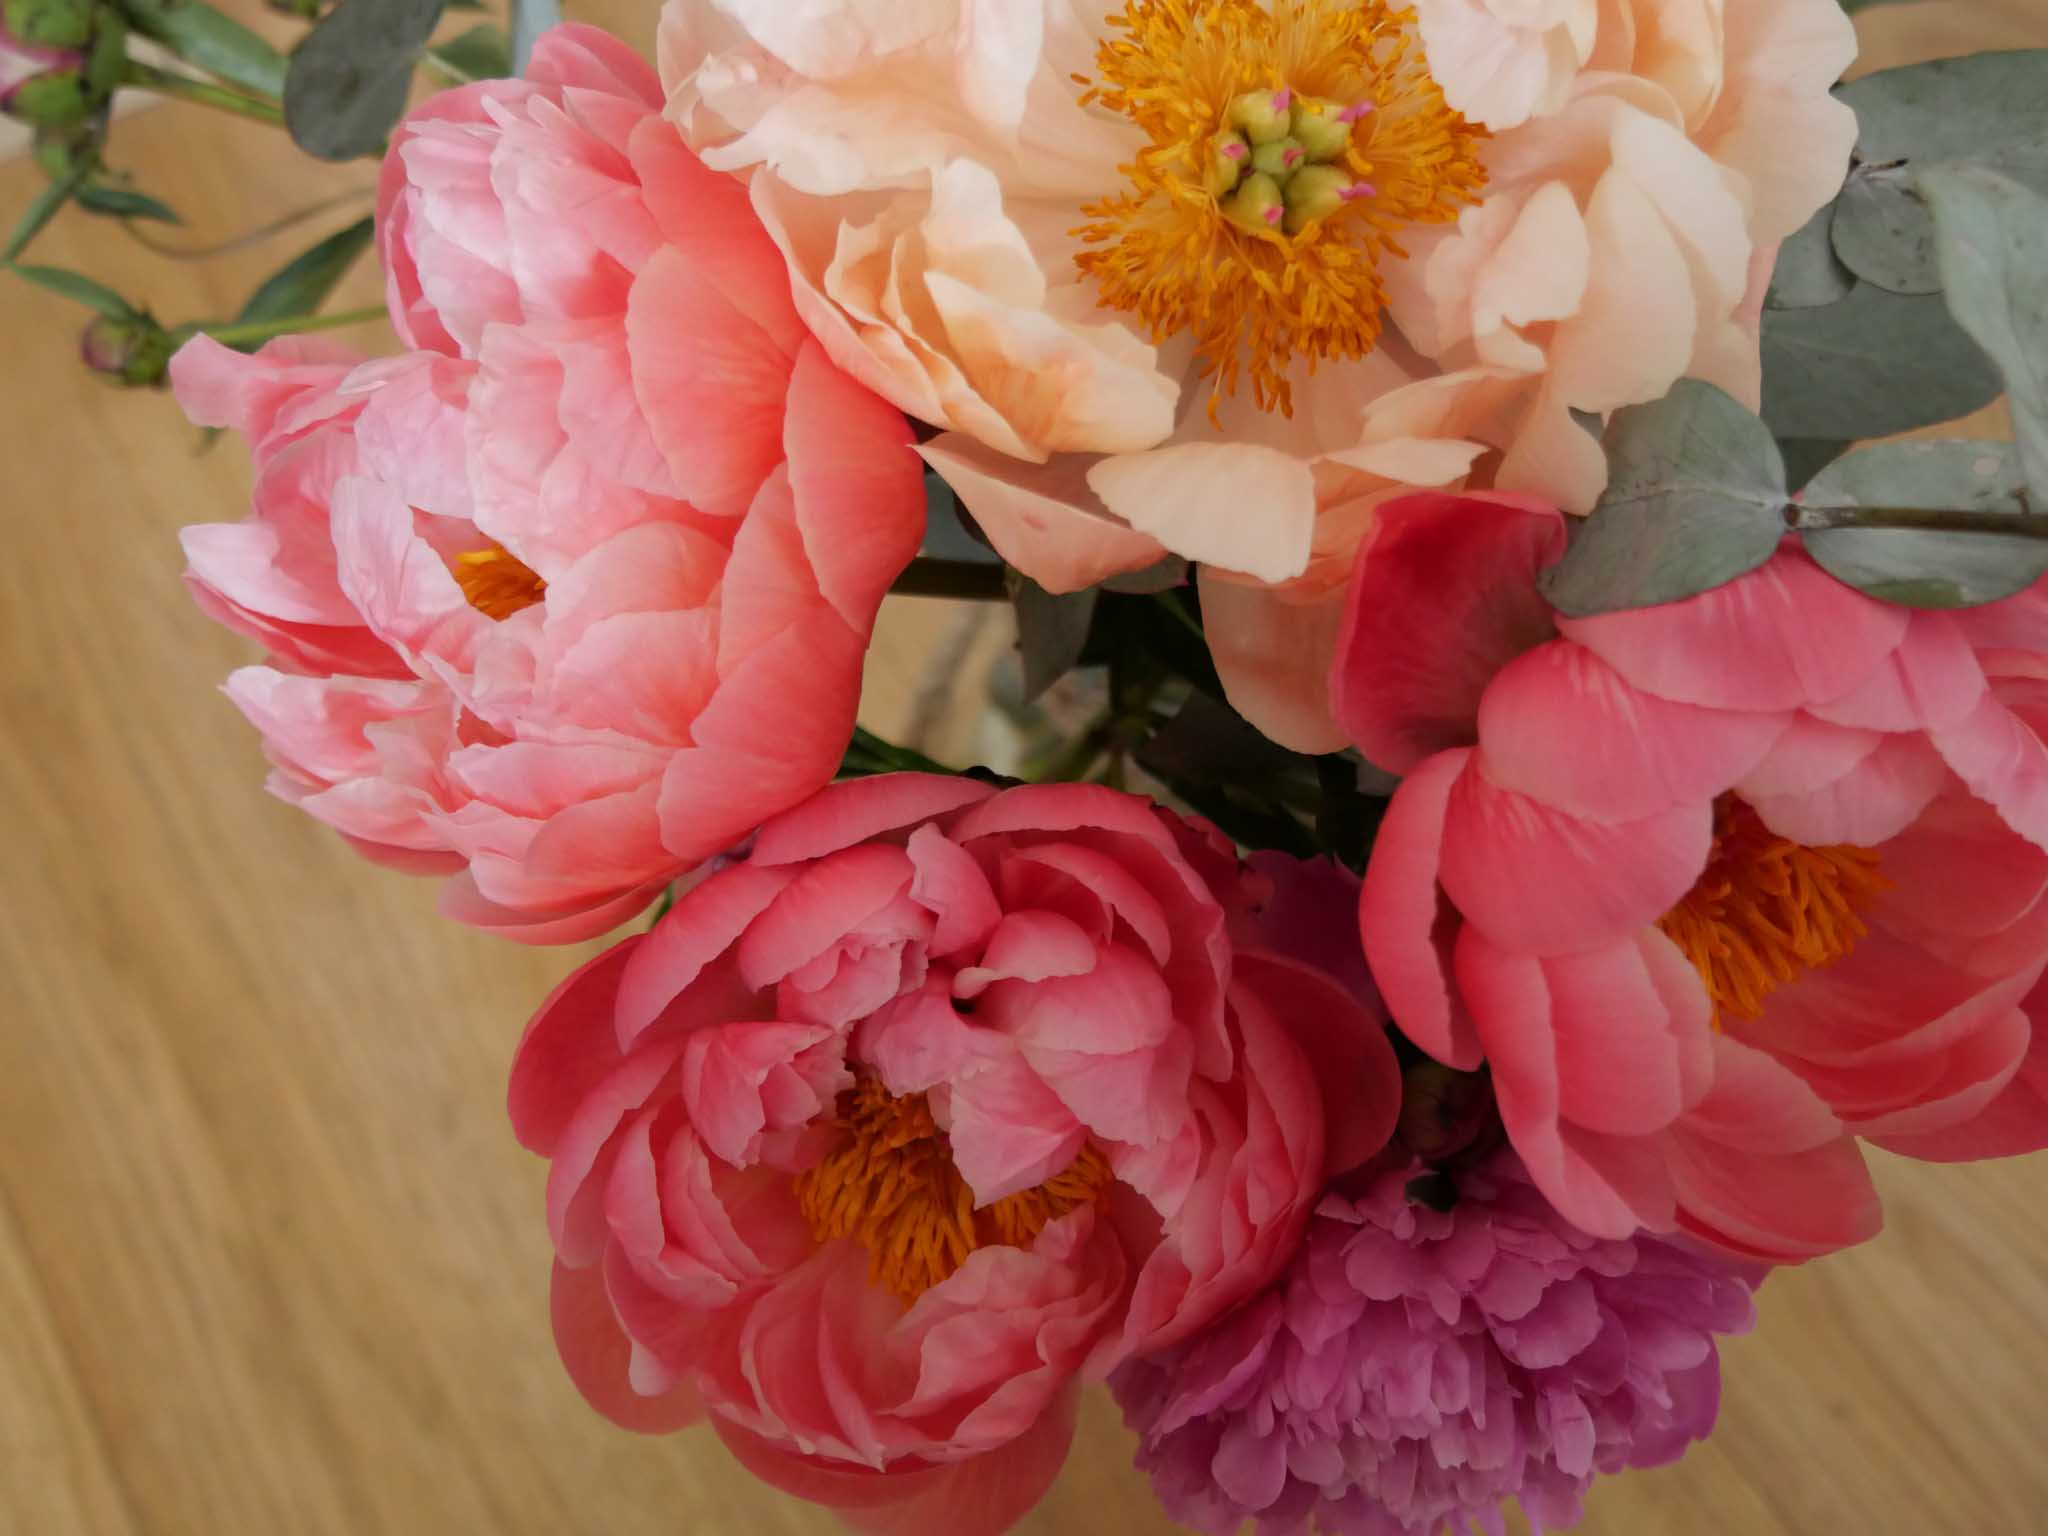 Pivoine camaieu de rose